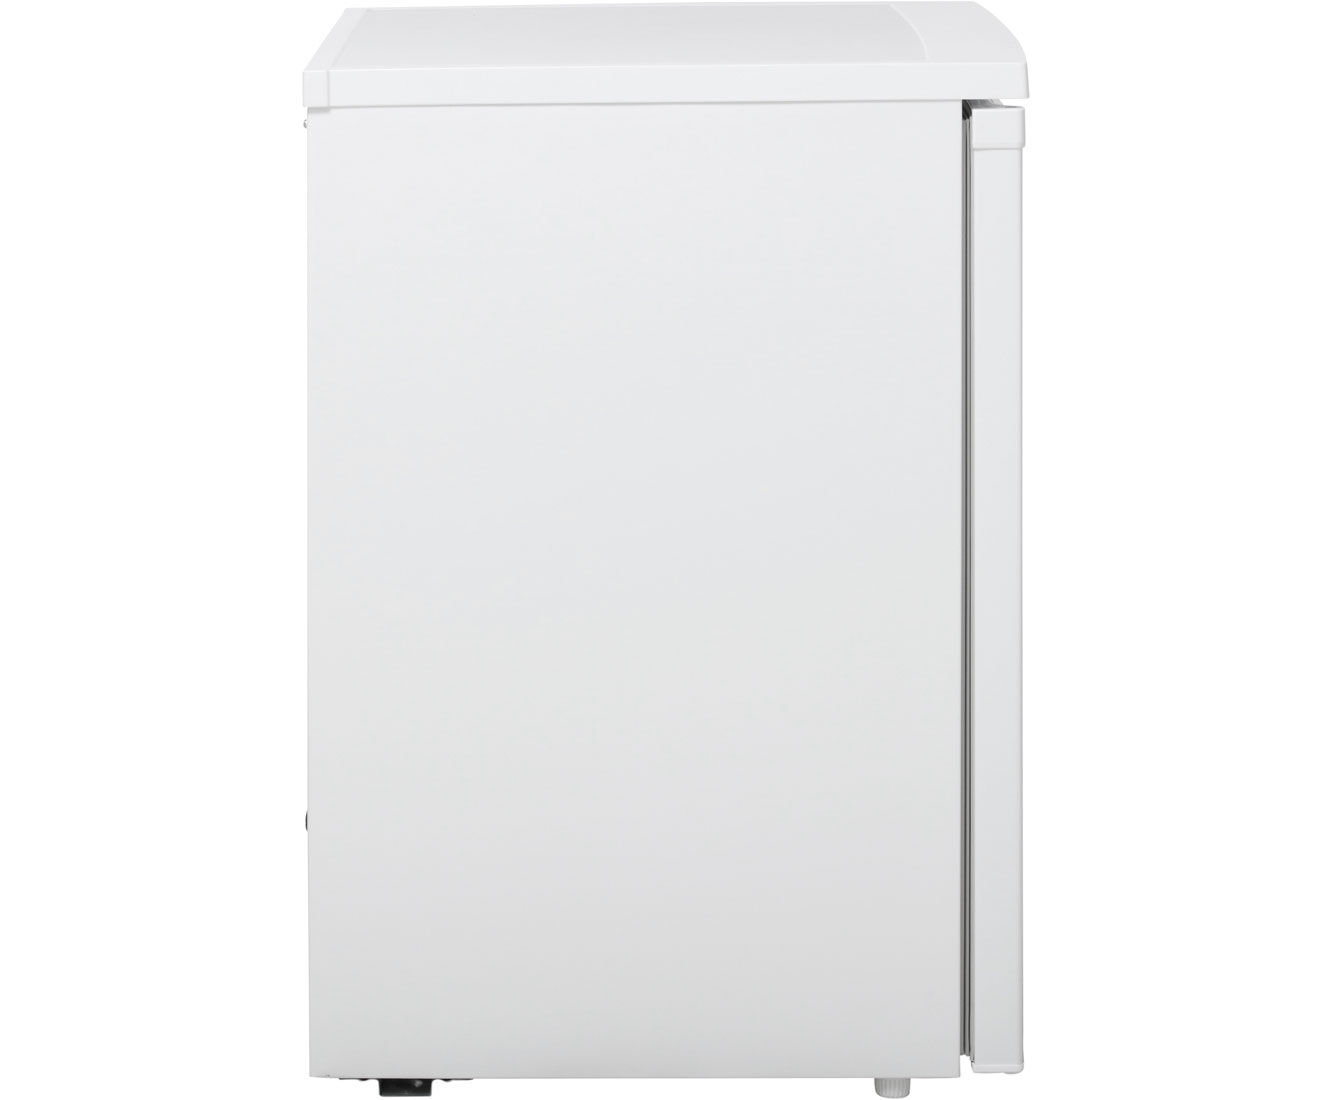 Bomann Kühlschrank Qualität : Bomann vs 2185 kühlschrank freistehend 56cm weiß neu ebay